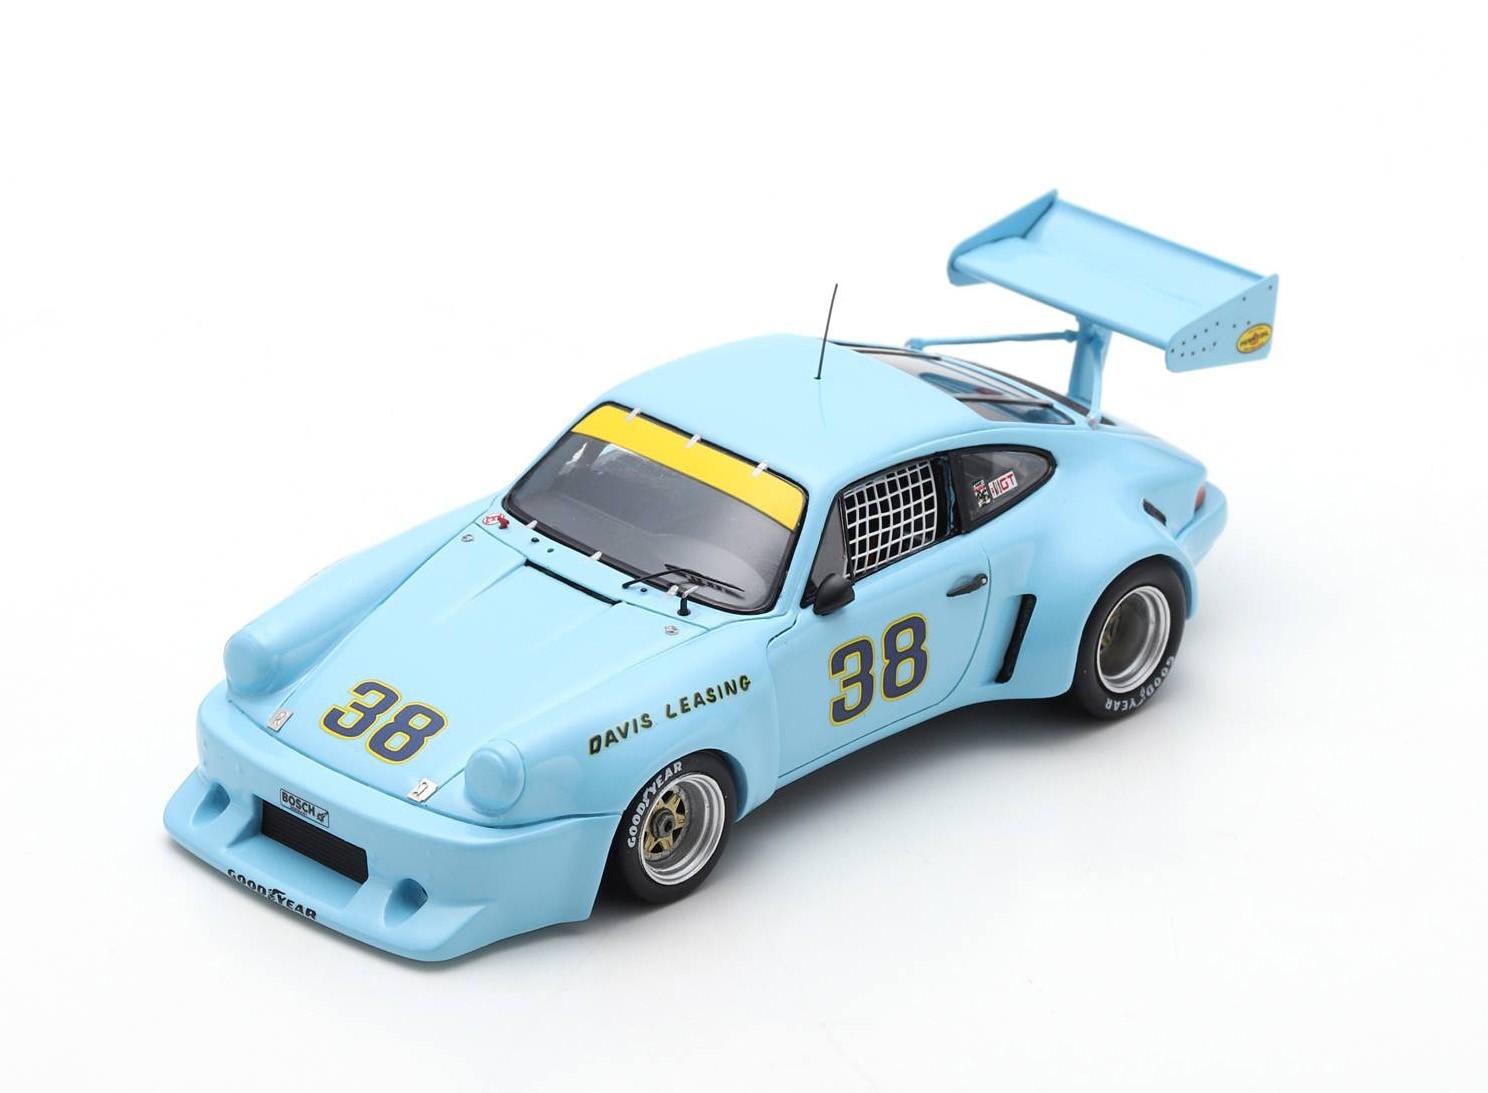 Porsche 911 RSR 38 100 miles Mid-Ohio 1977 John Paul Spark SUS045